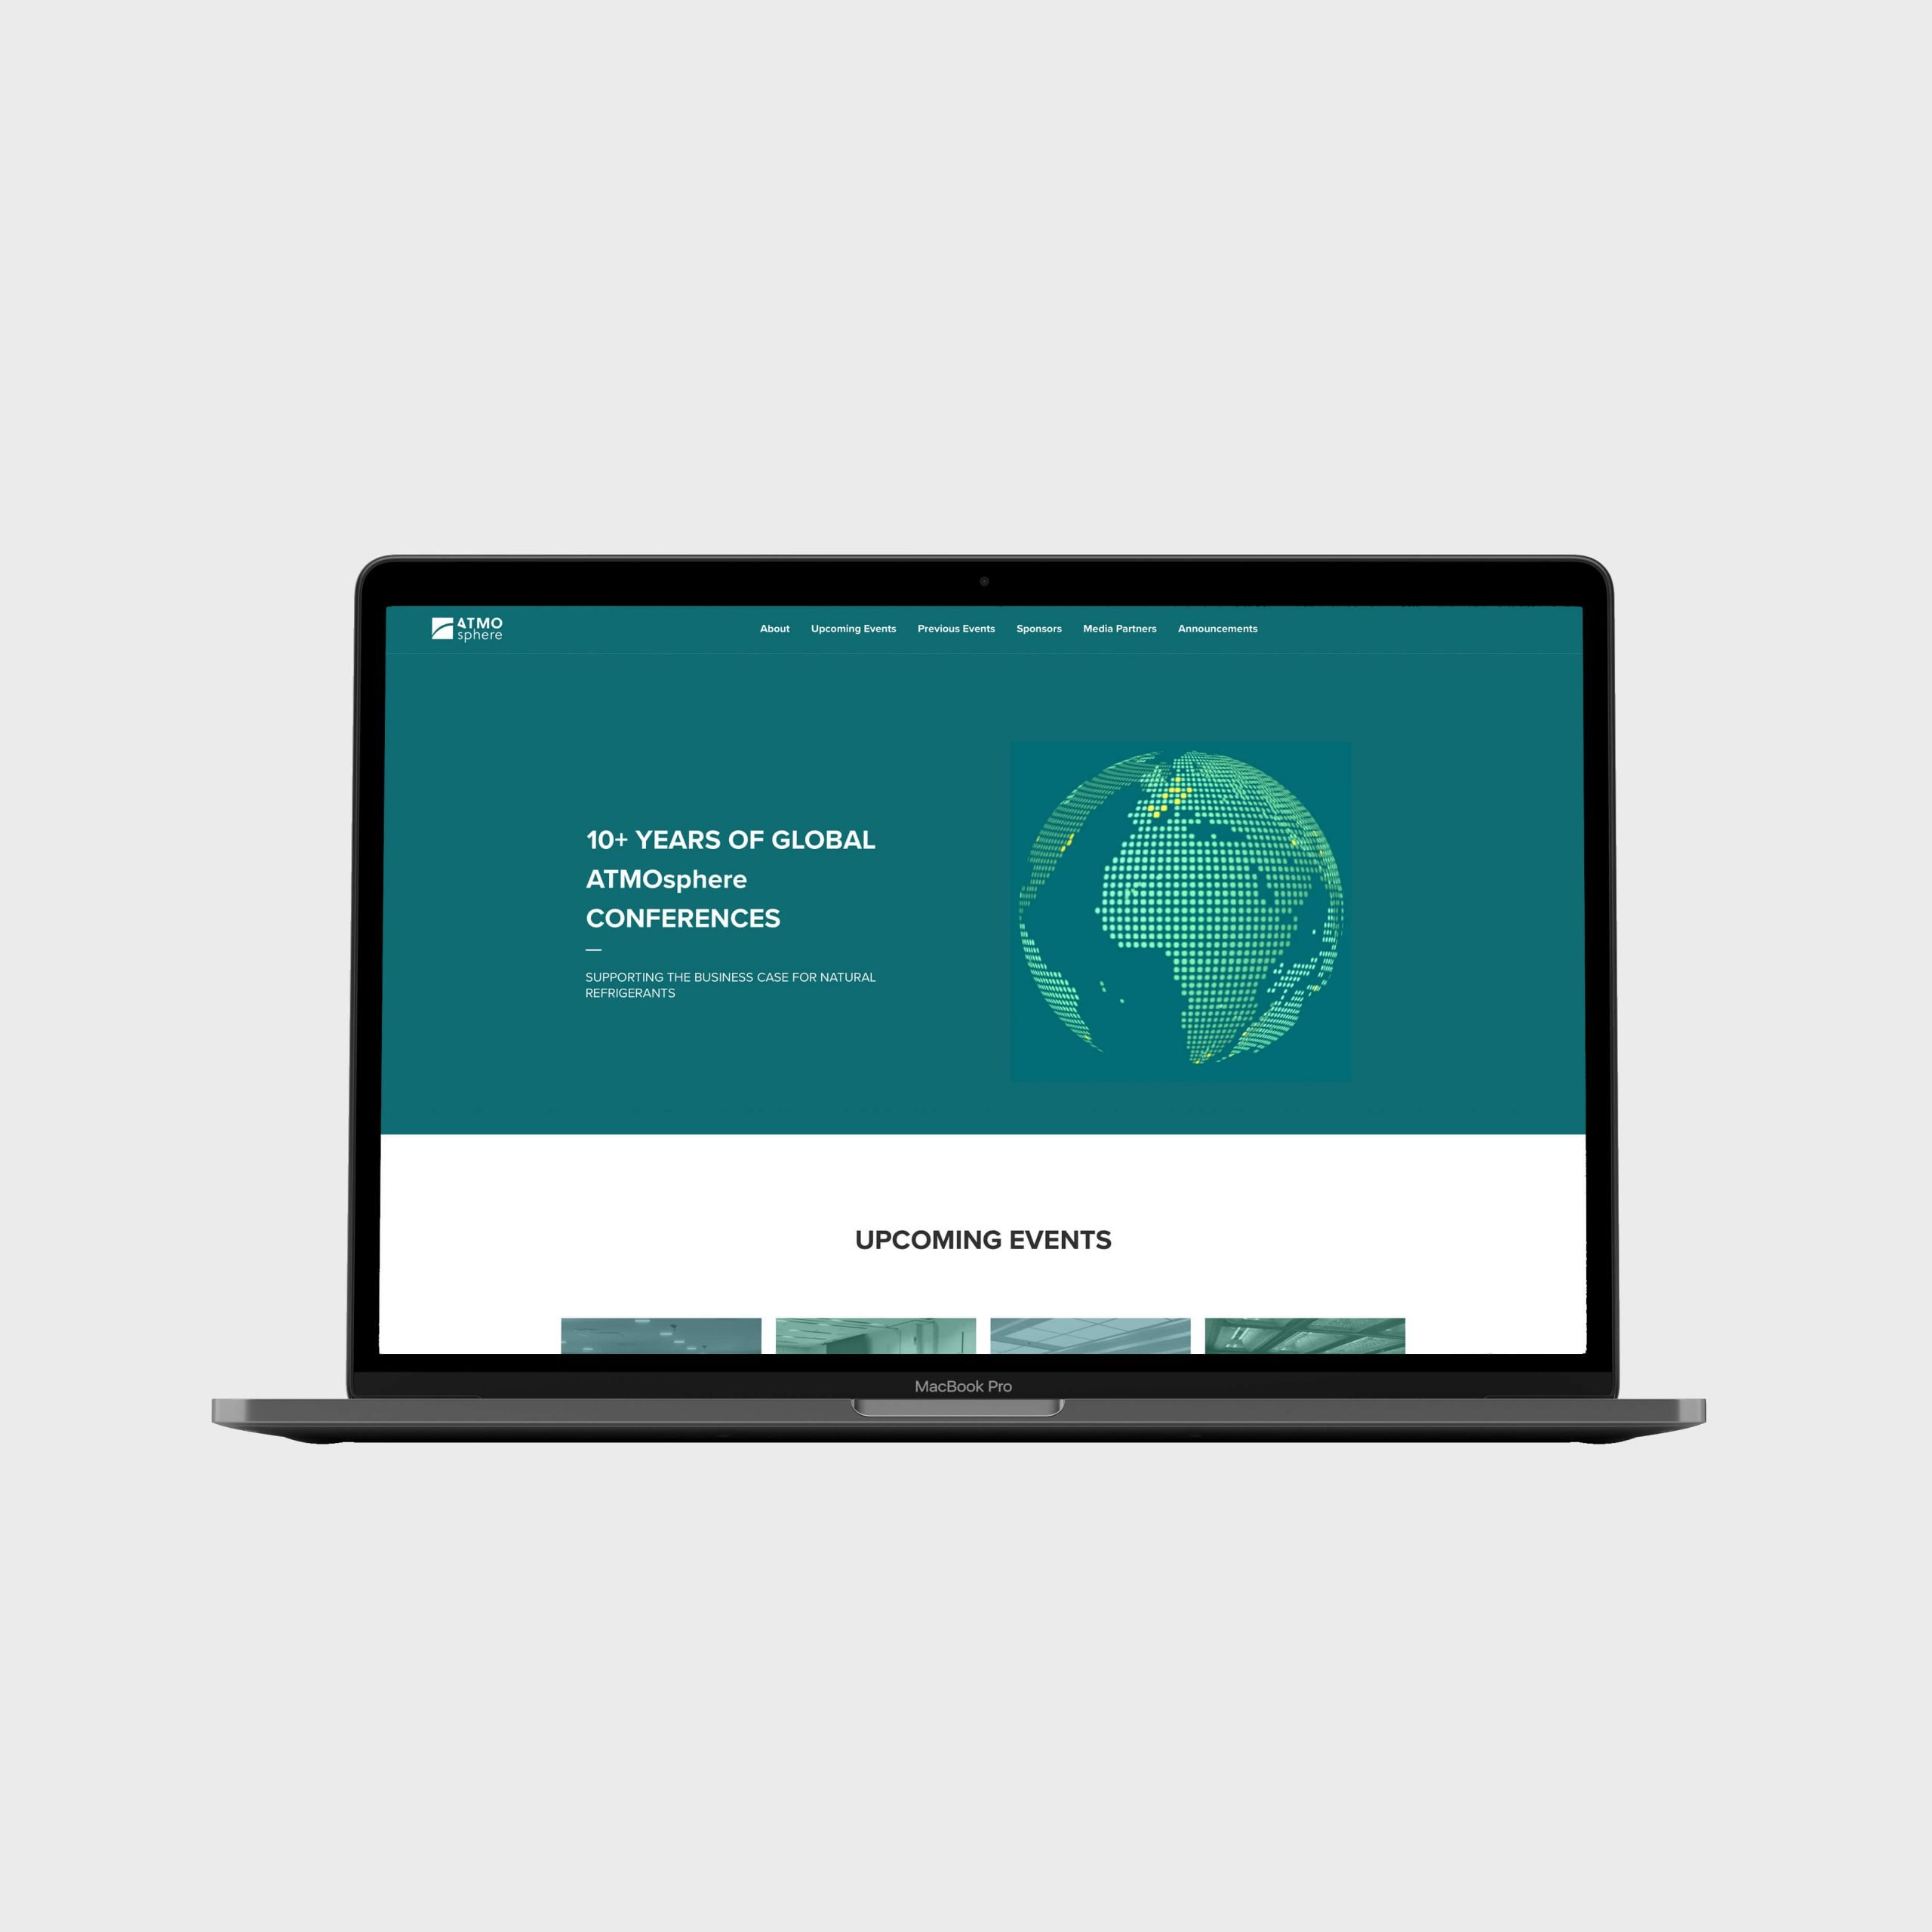 ATMO.org